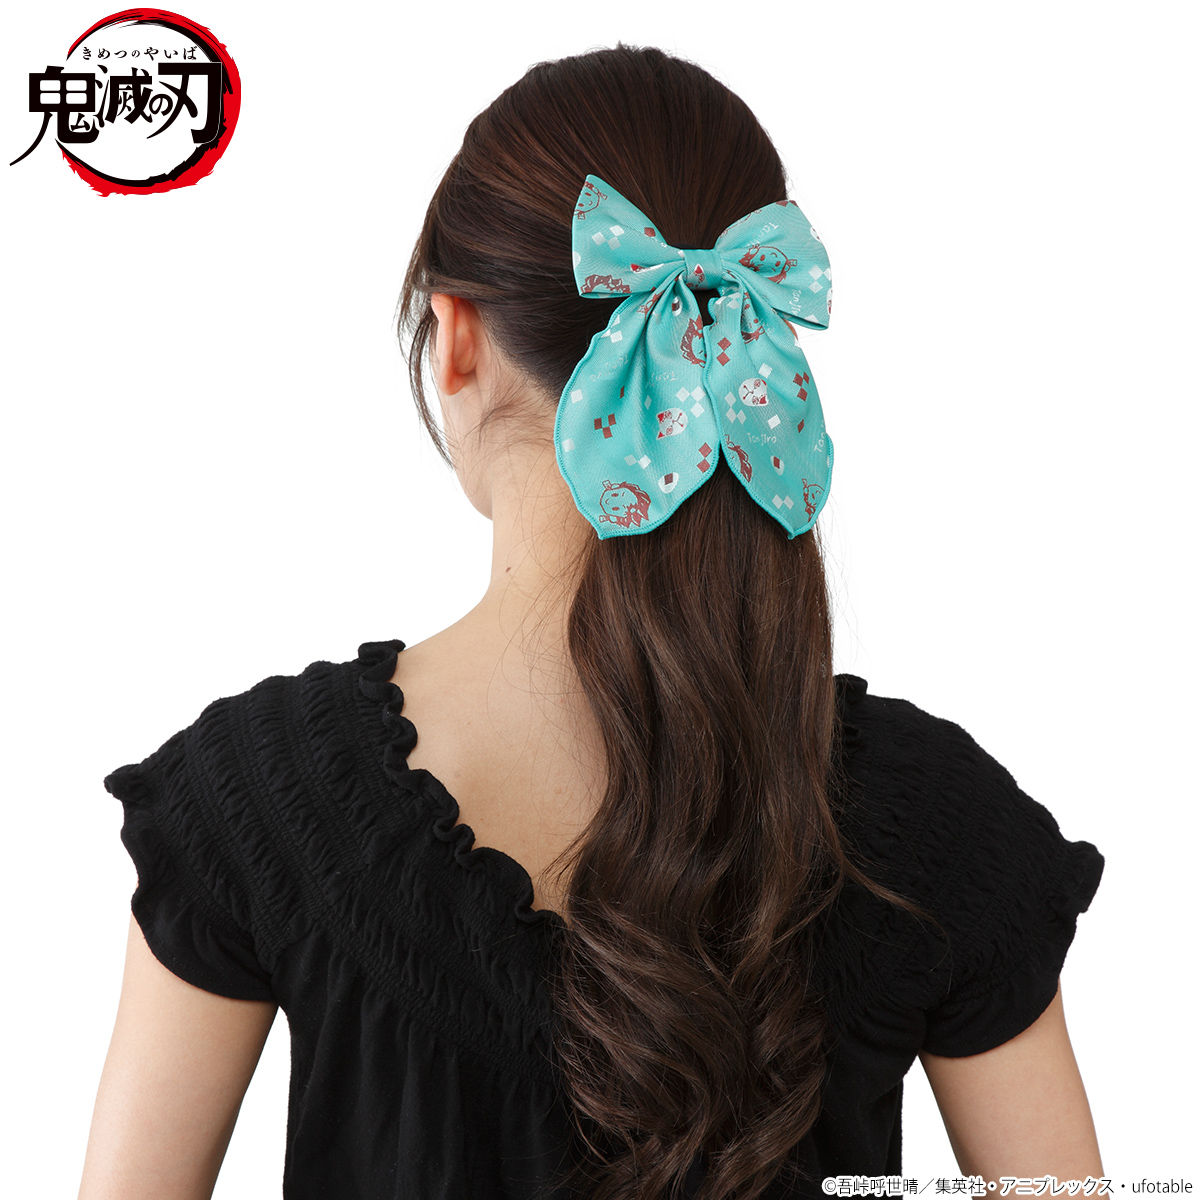 Ribbon Hair Tie—Demon Slayer: Kimetsu no Yaiba